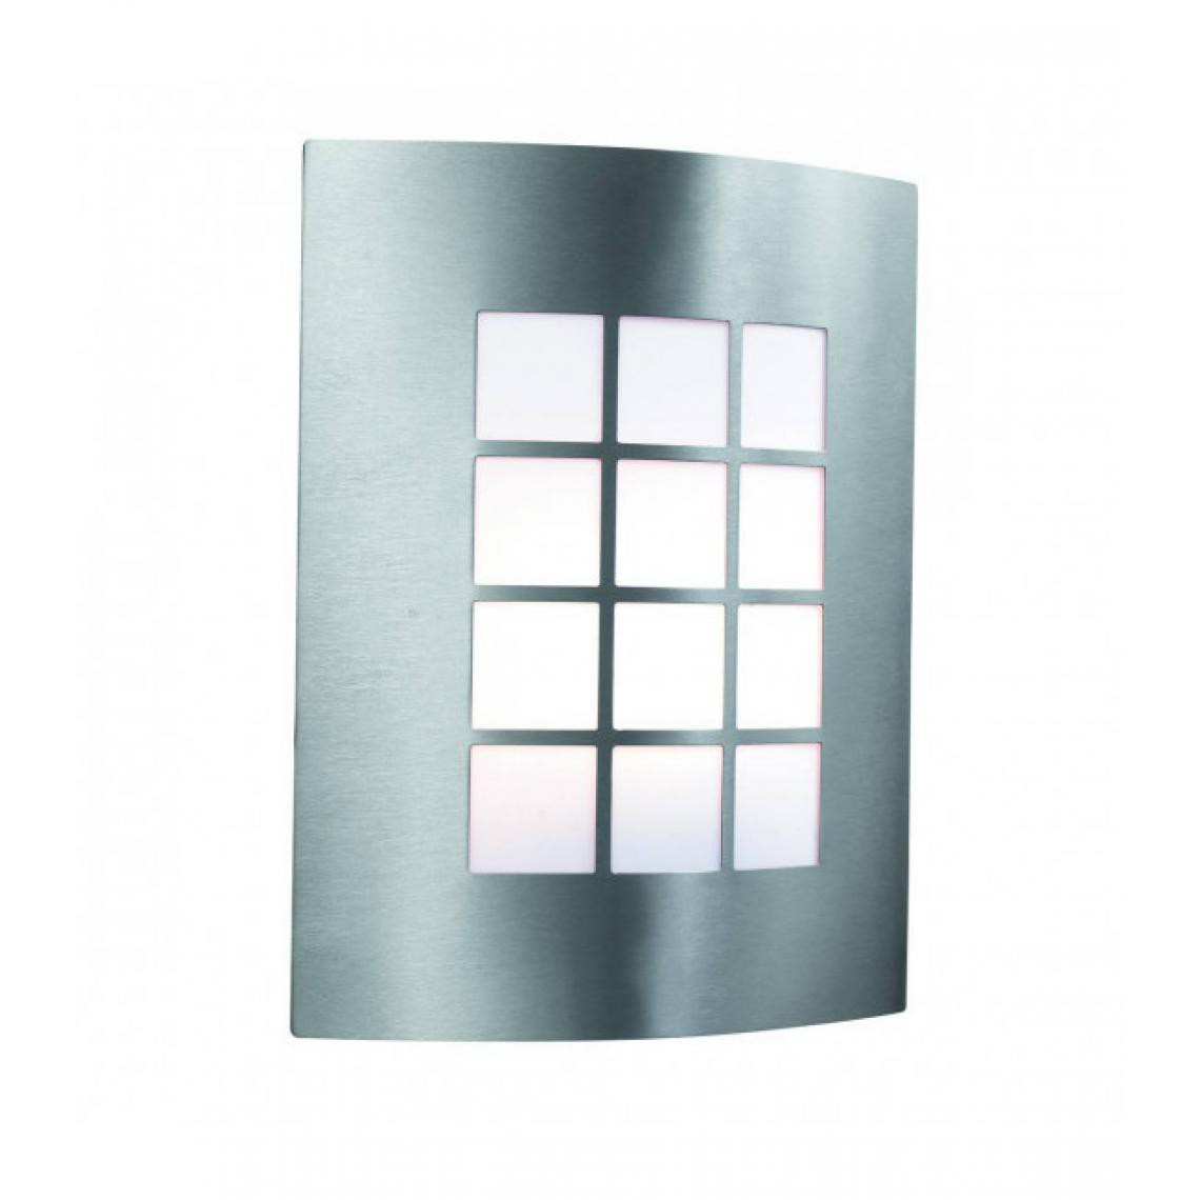 Searchlight Applique 27 cm Outdoor Lights, en acier inoxydable et polycarbonate